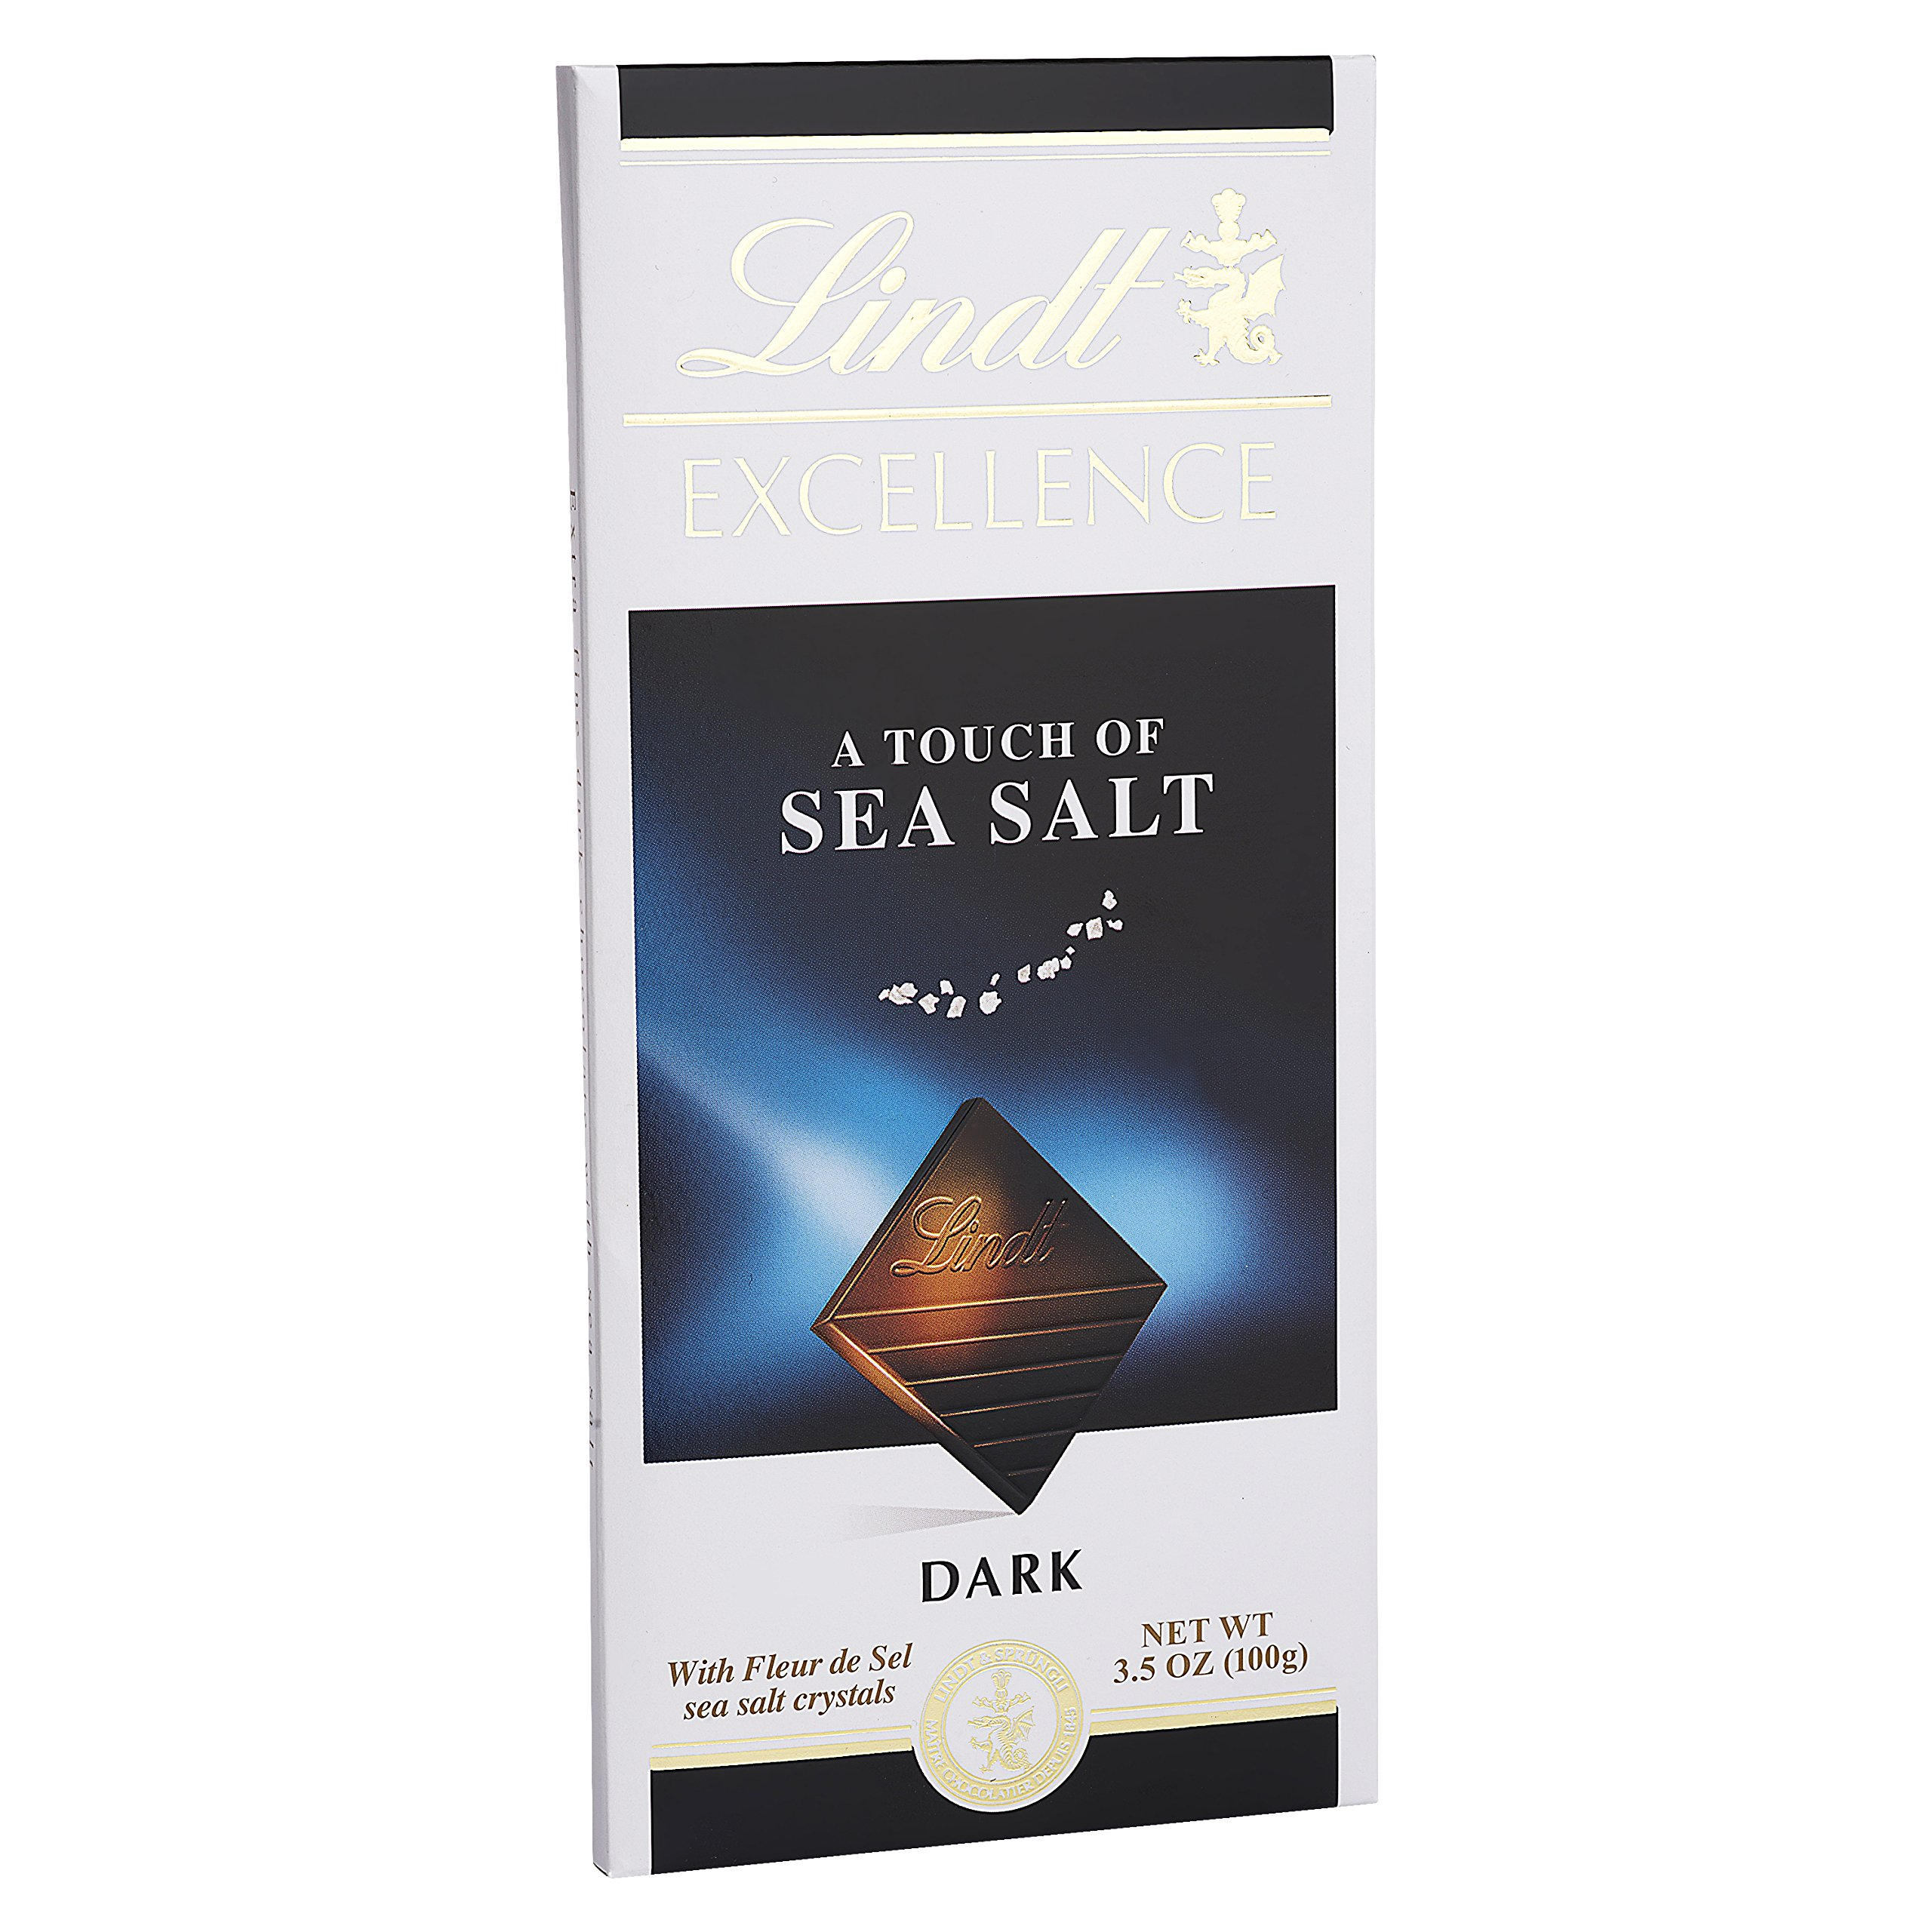 Lindt Excellence Sea Salt Bar, 3.5 oz